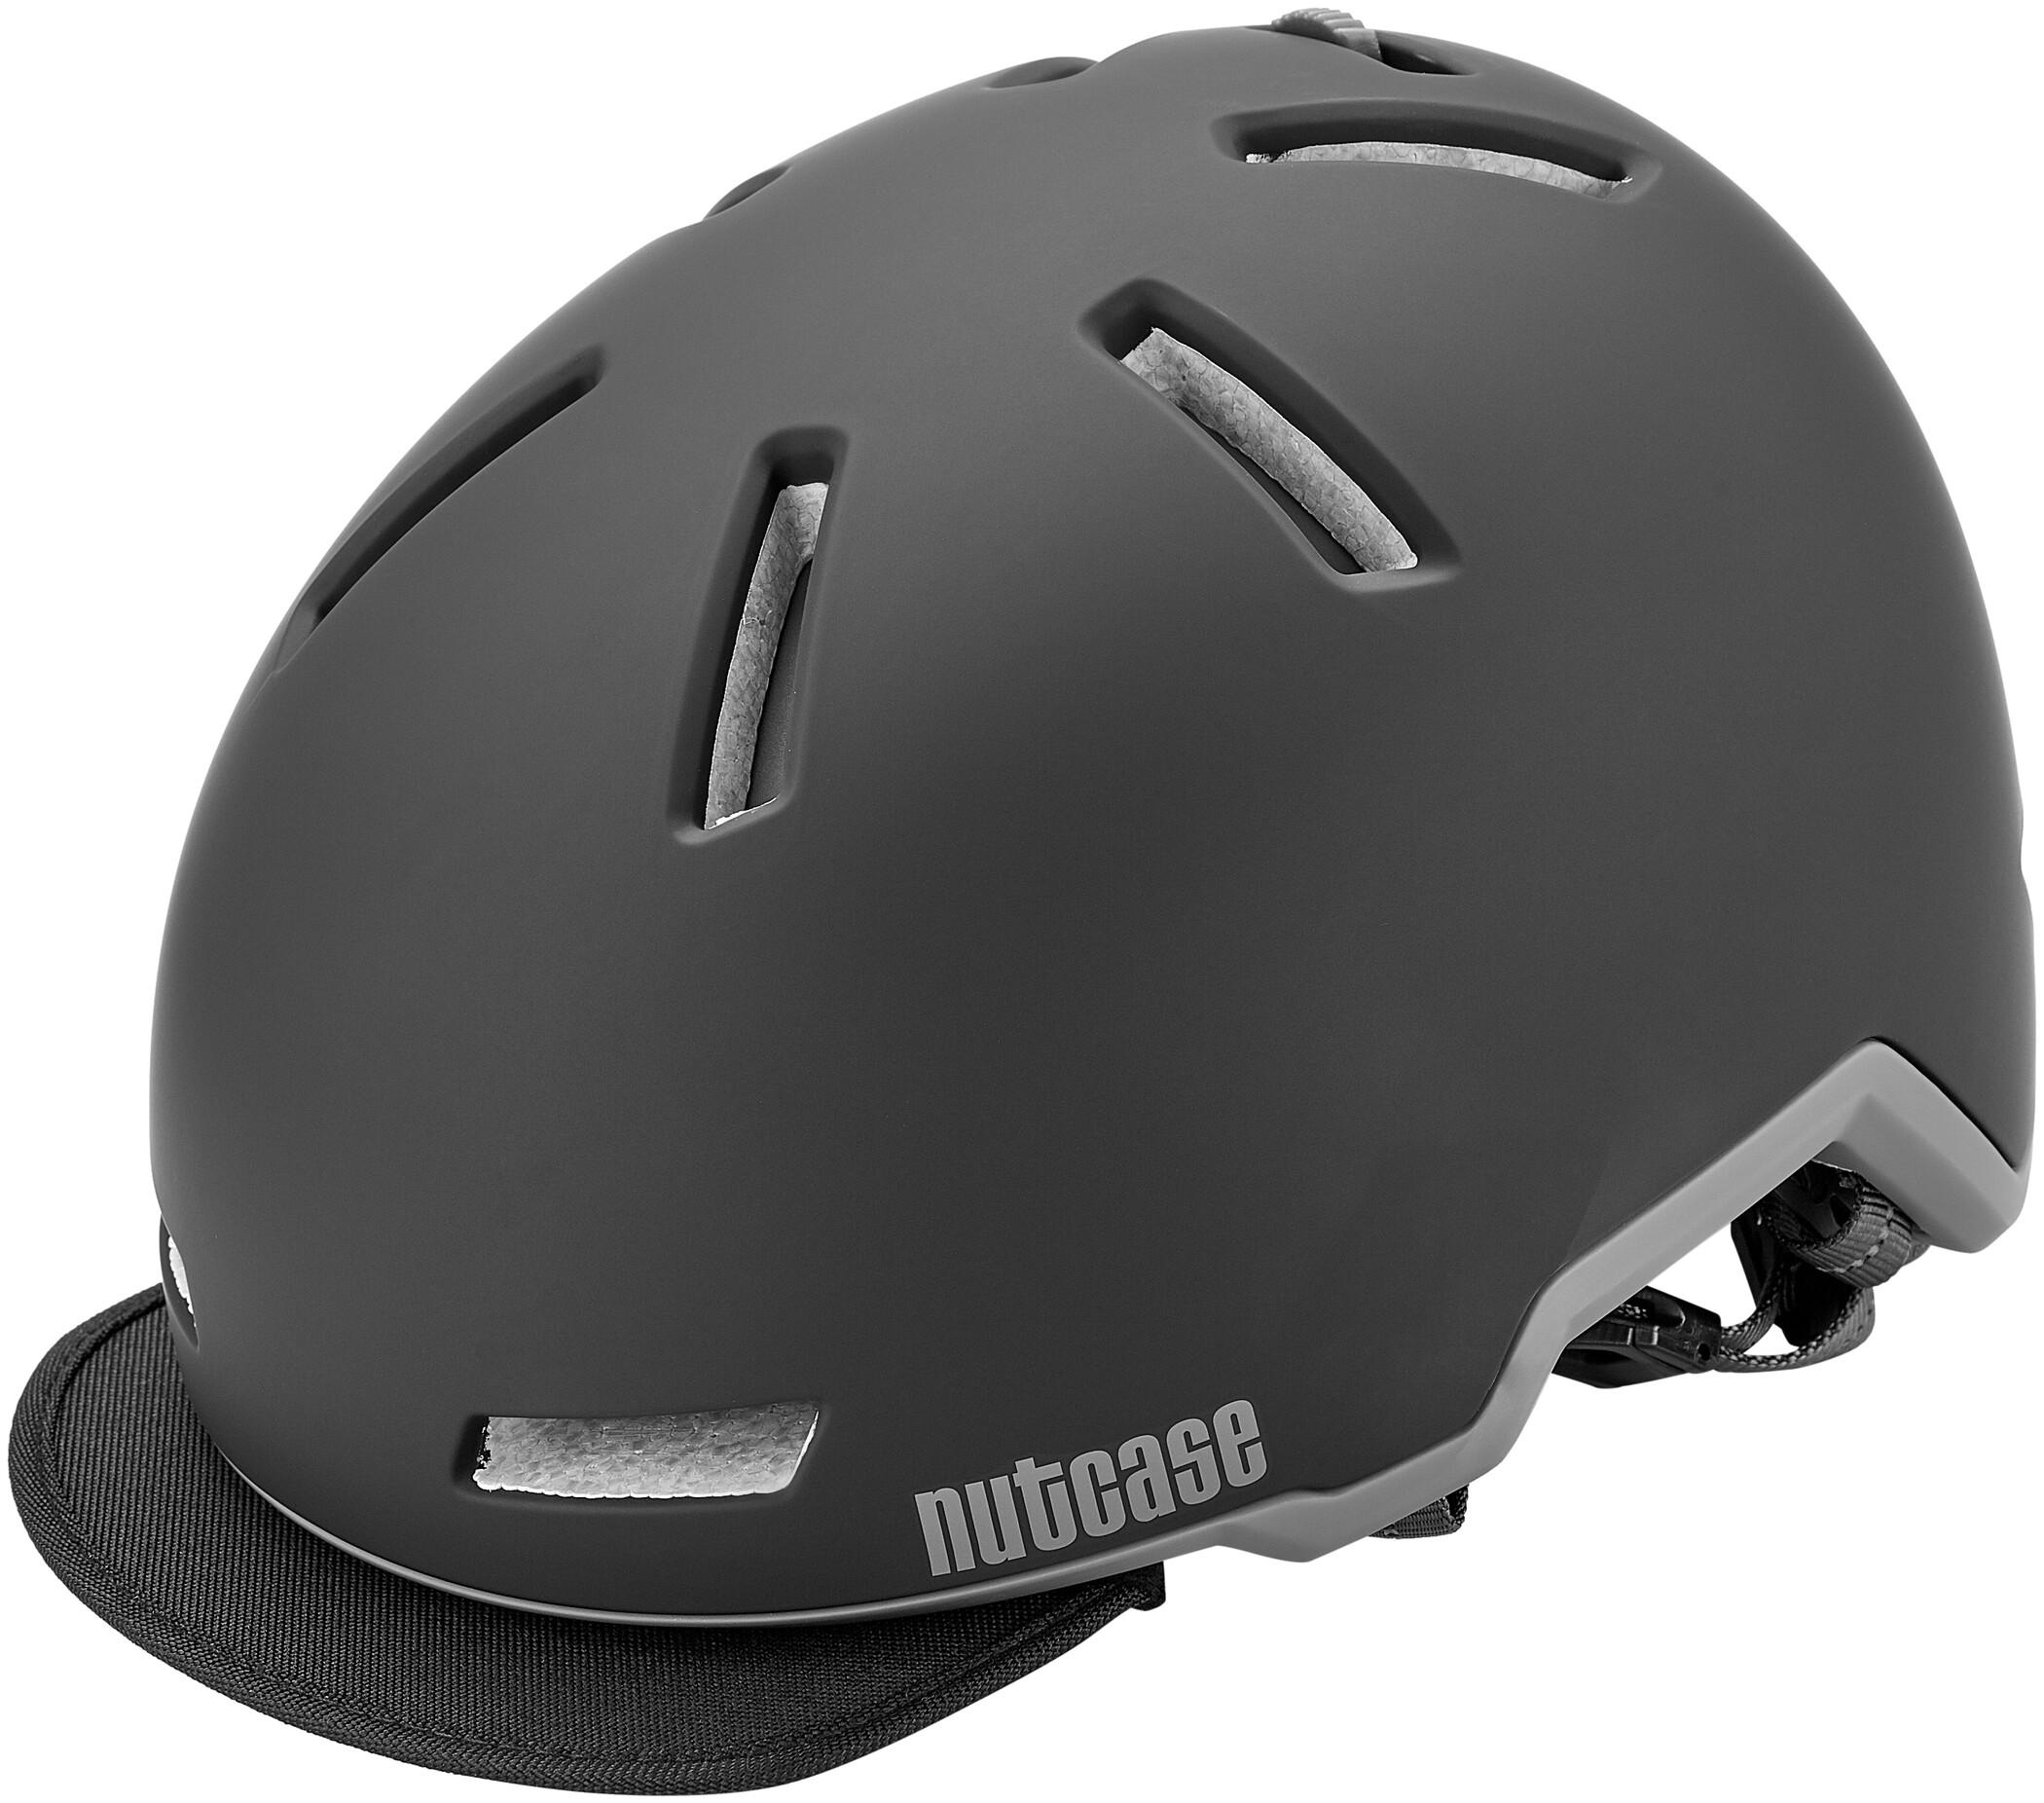 Nutcase Tracer Cykelhjelm, midnight black matte (2019) | Helmets